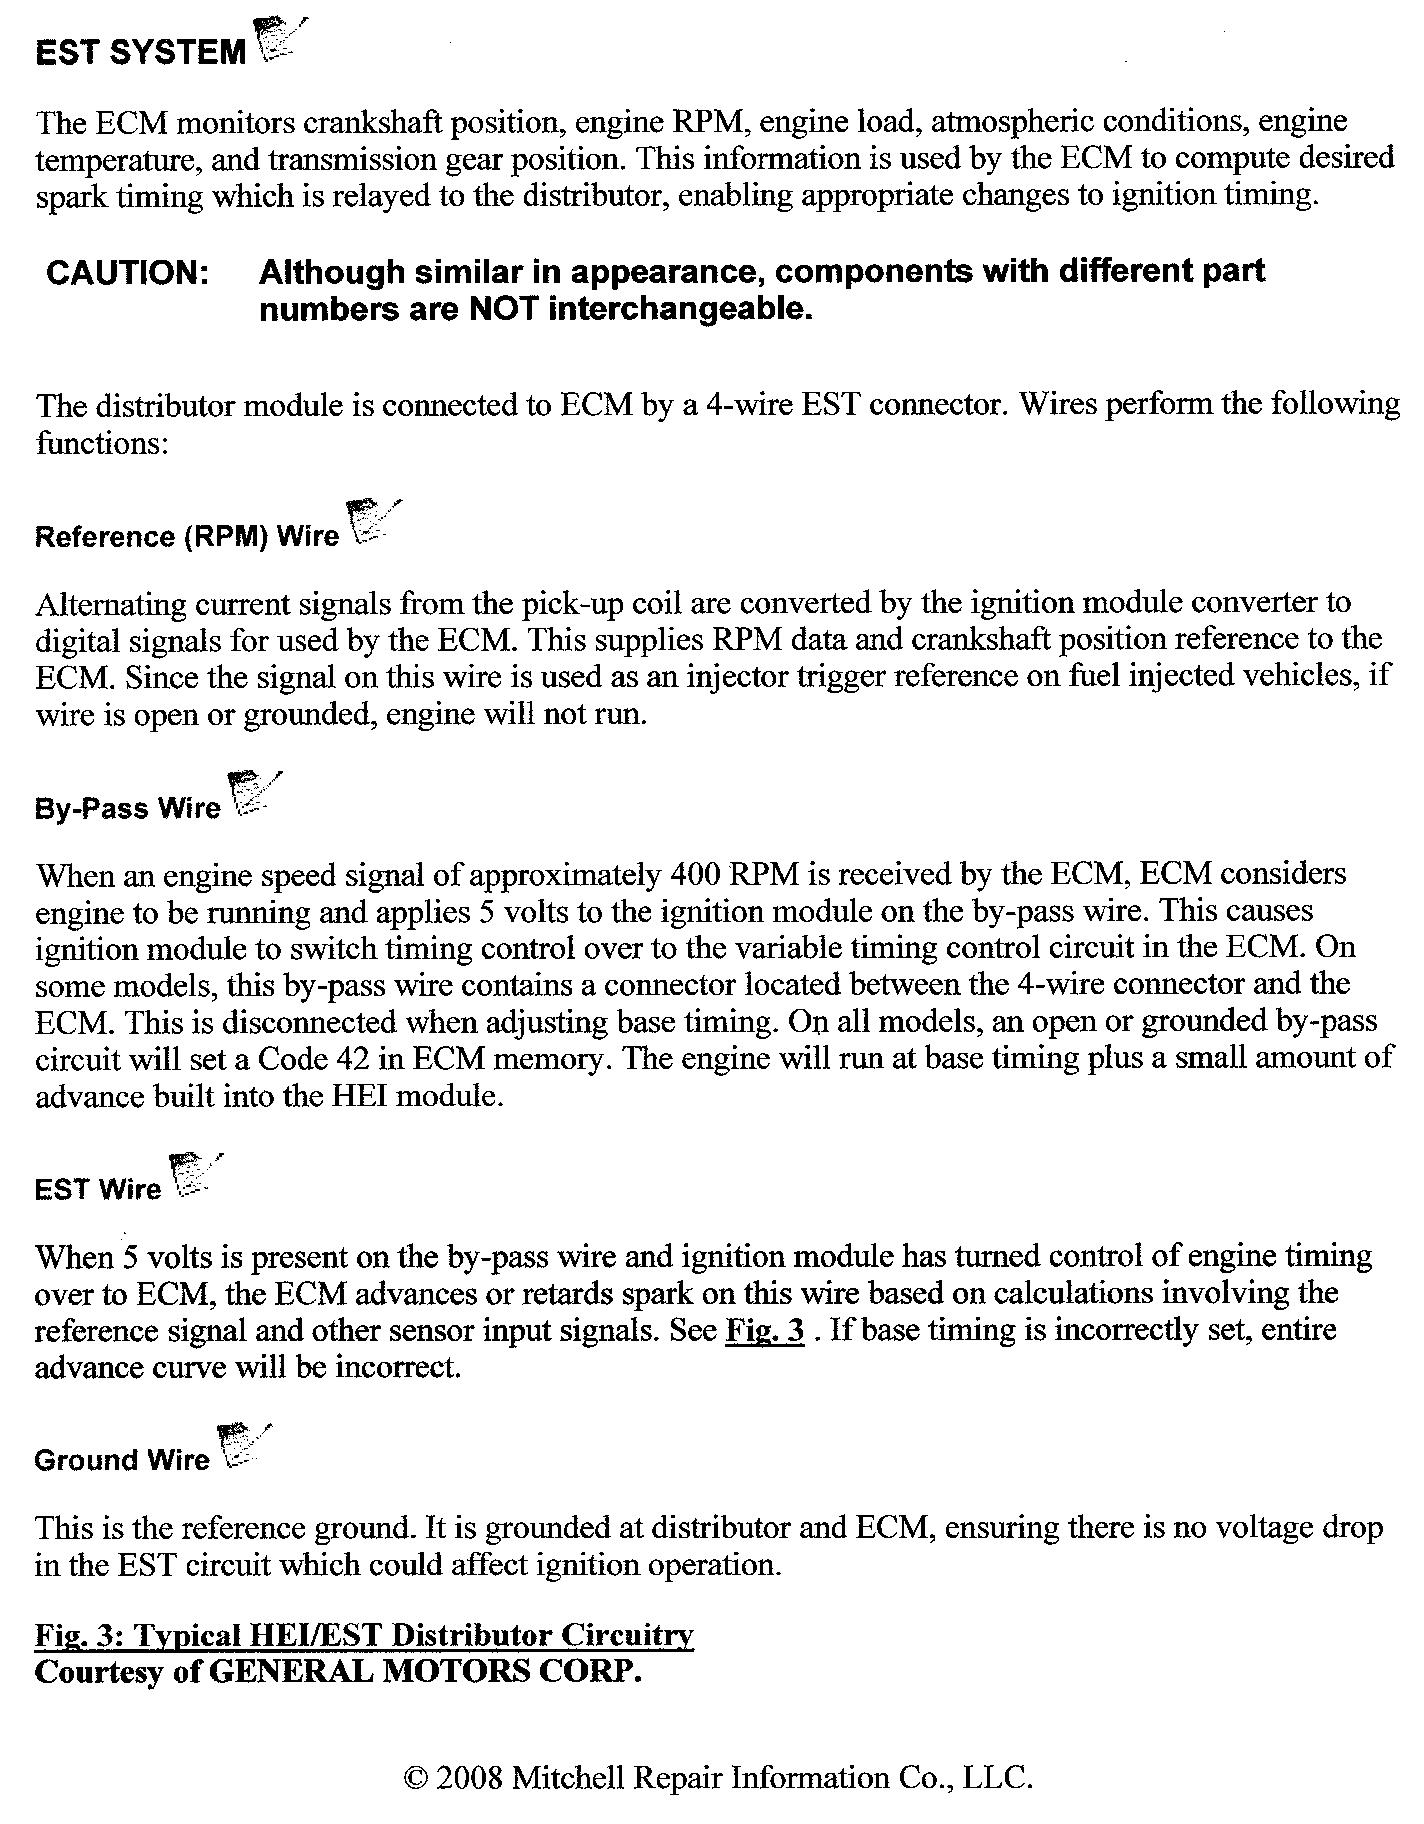 Question On 1989 Camaro Tachometer  My Tachometer Has